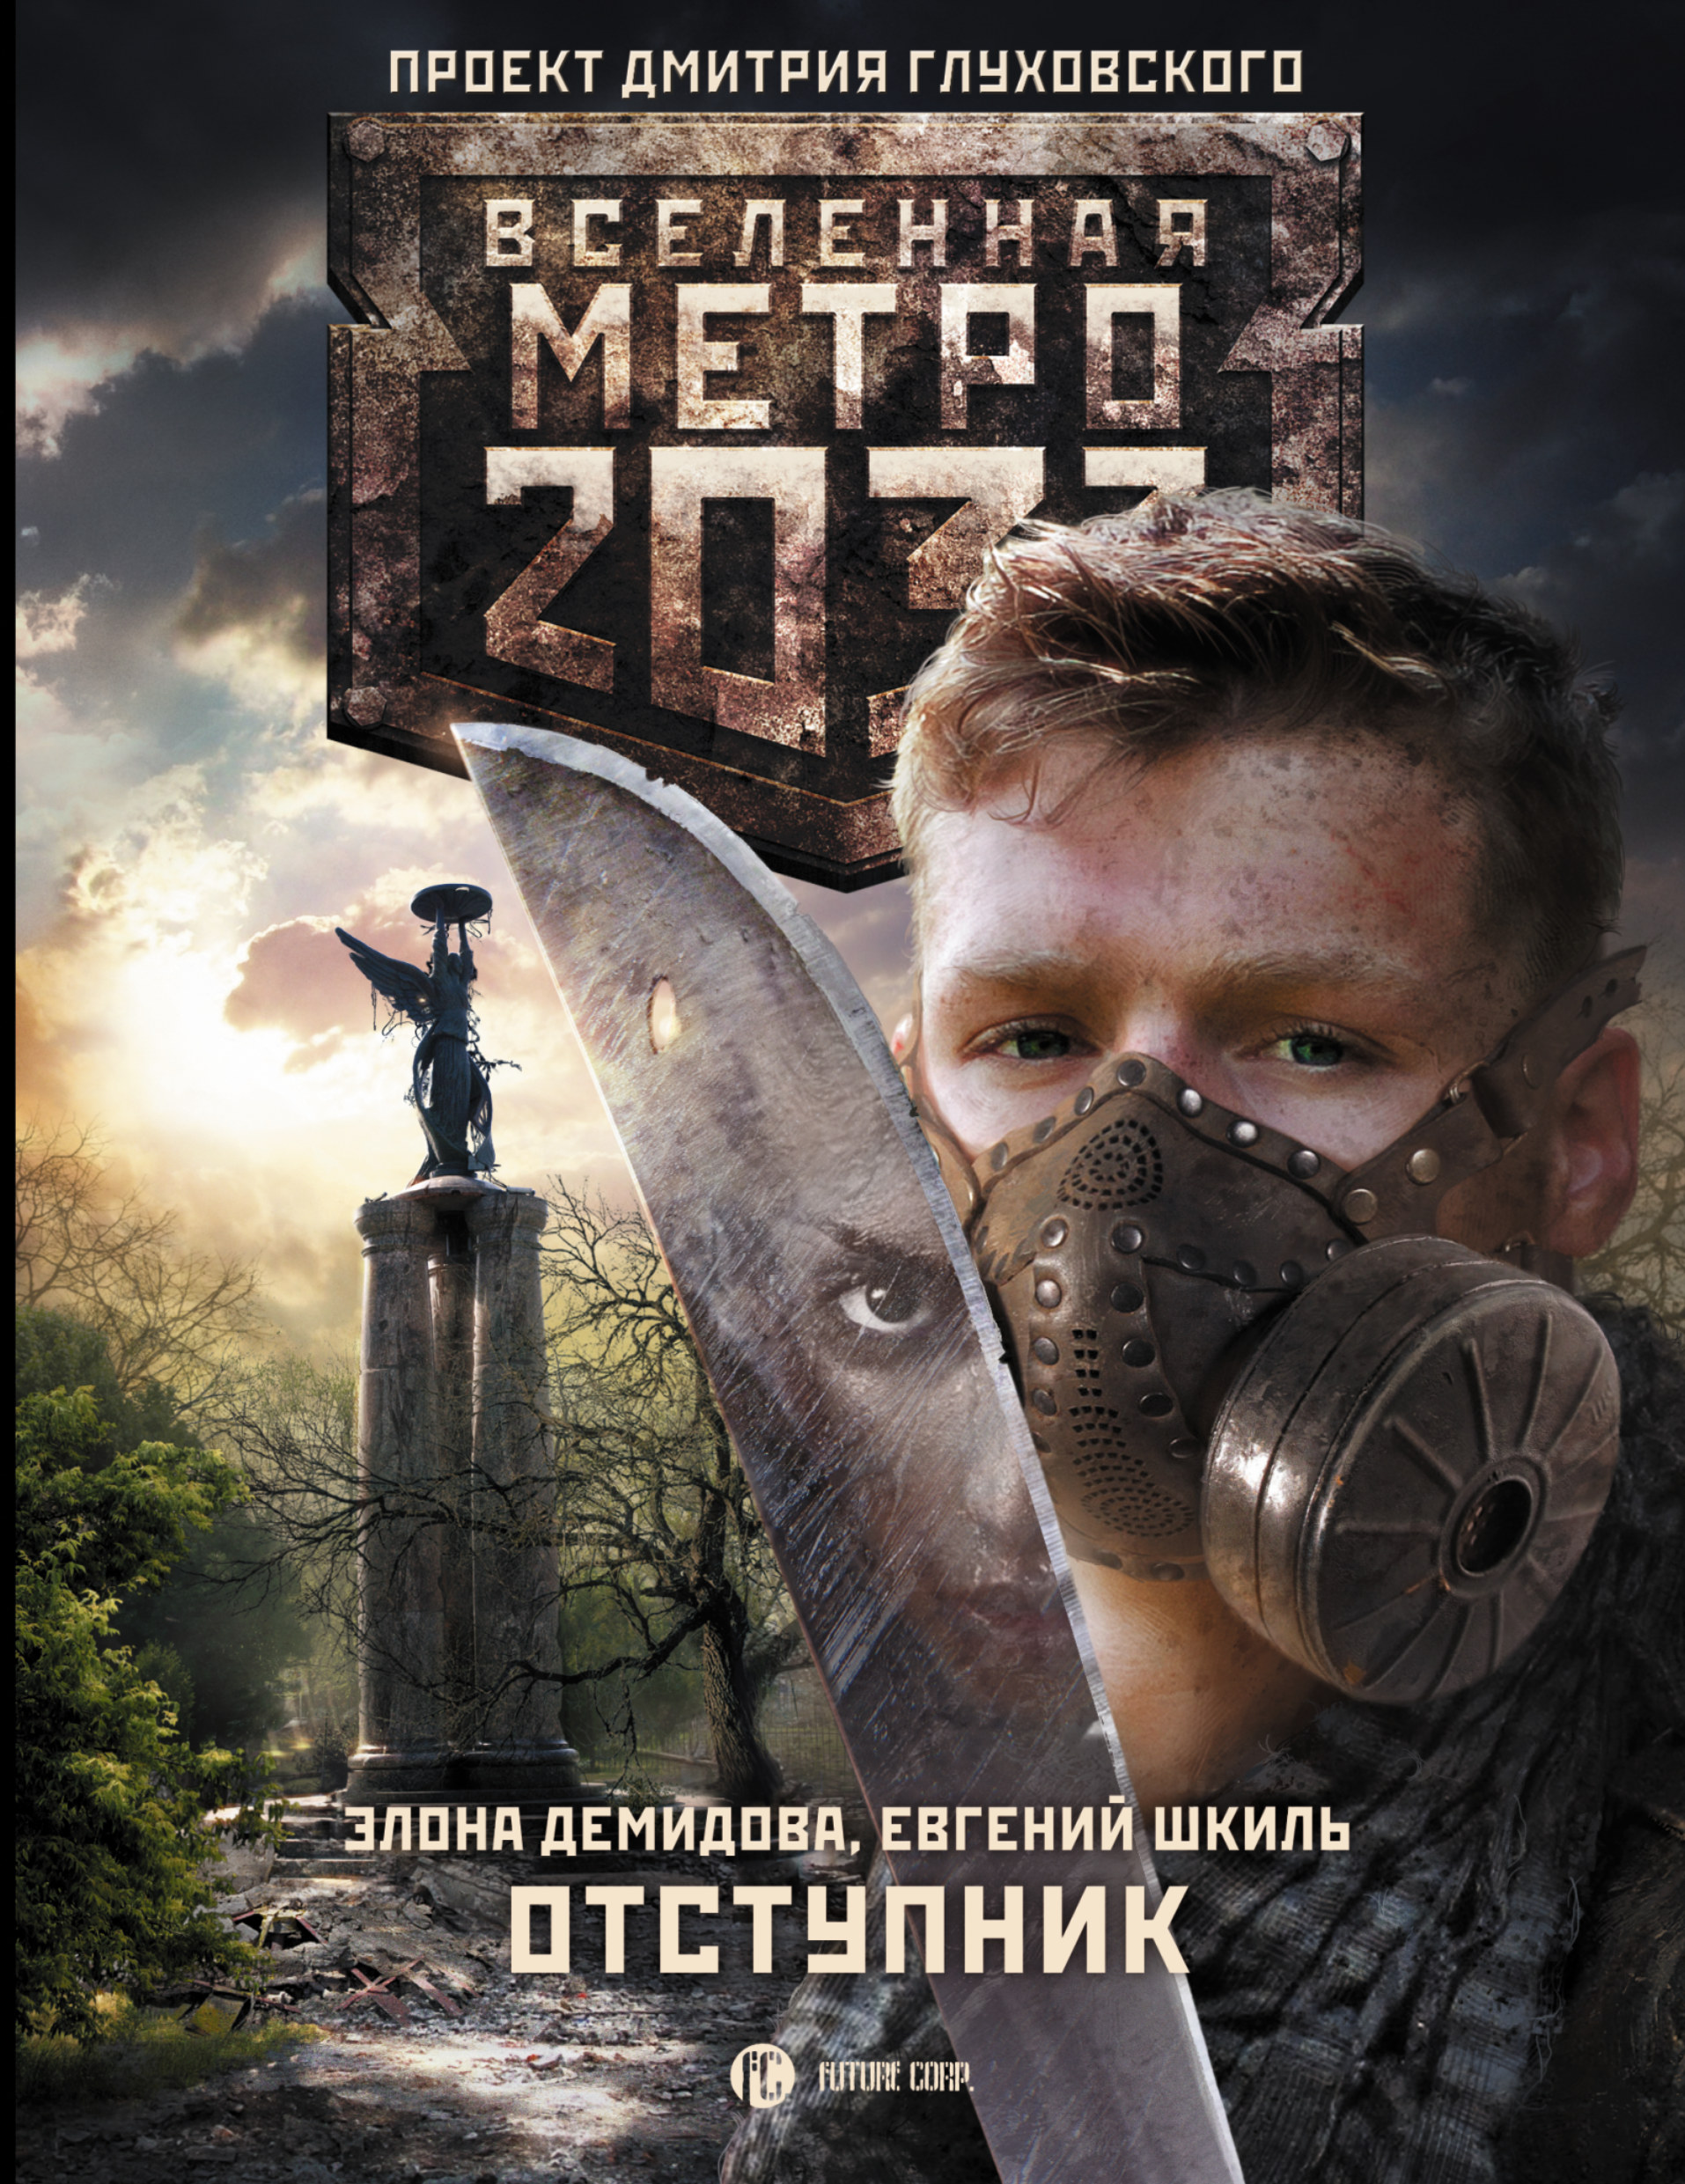 Элона Демидова, Евгений Шкиль Метро 2033: Отступник